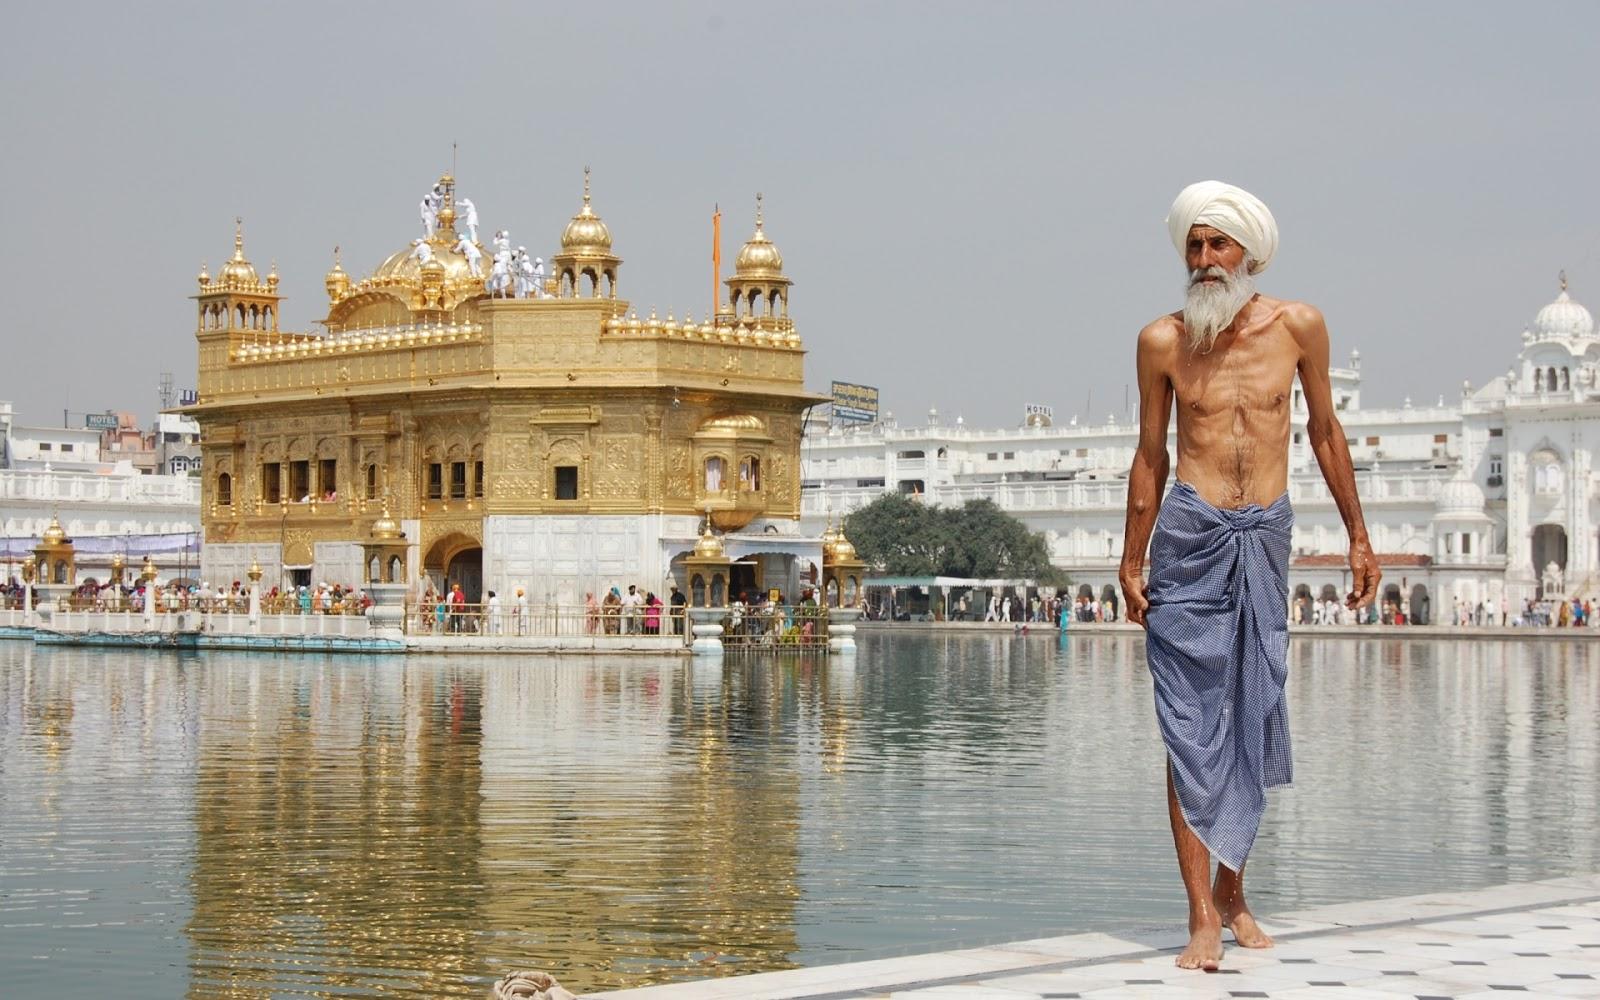 http://4.bp.blogspot.com/-vlA634x50L0/UPKbzw8ziFI/AAAAAAAAASA/fs6xkymJ2nY/s1600/the-golden-temple-india-1920x1200.jpg